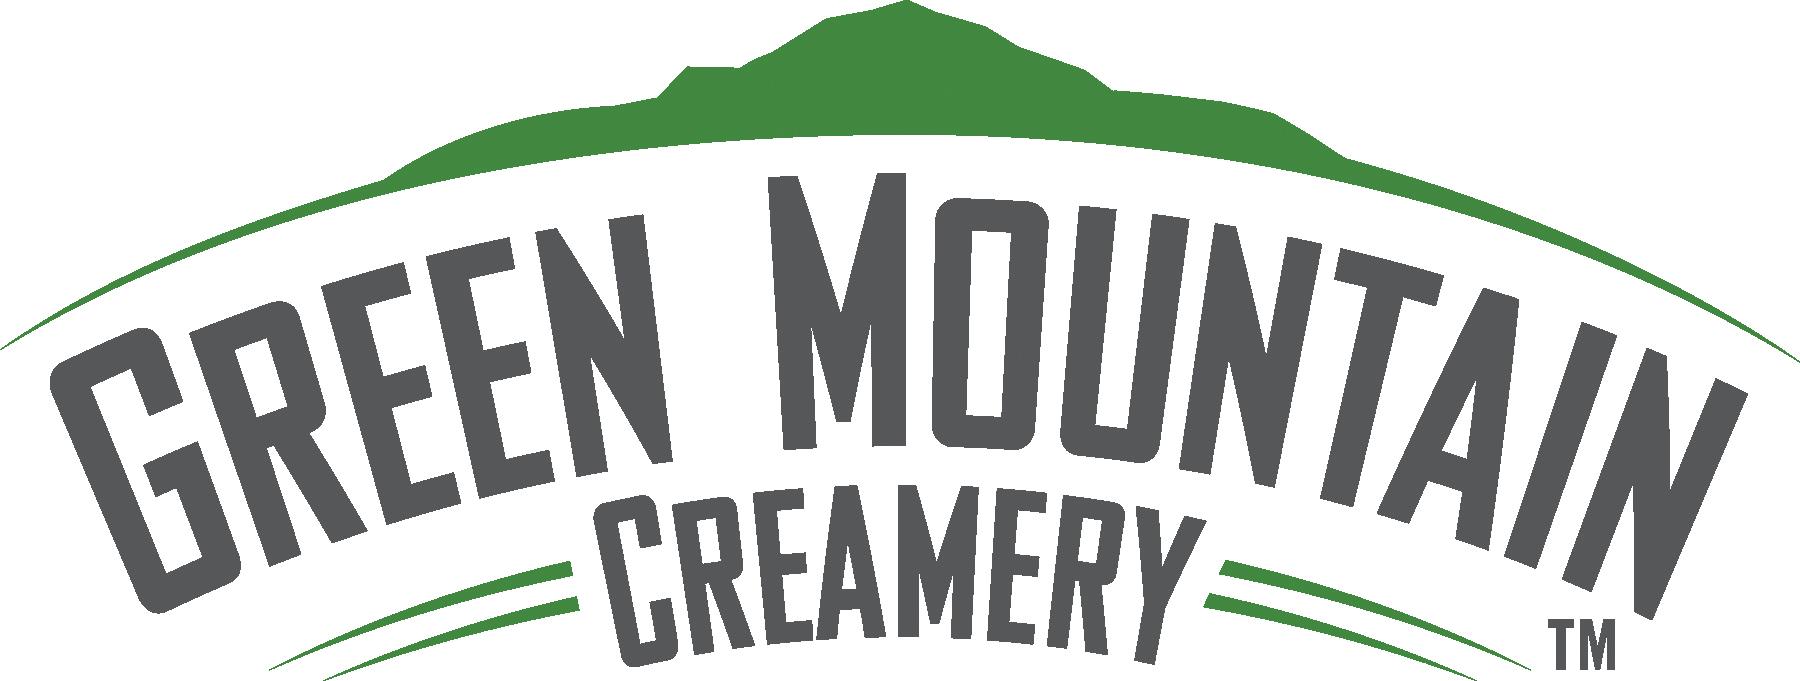 Berry Creamy Yogurt - logo